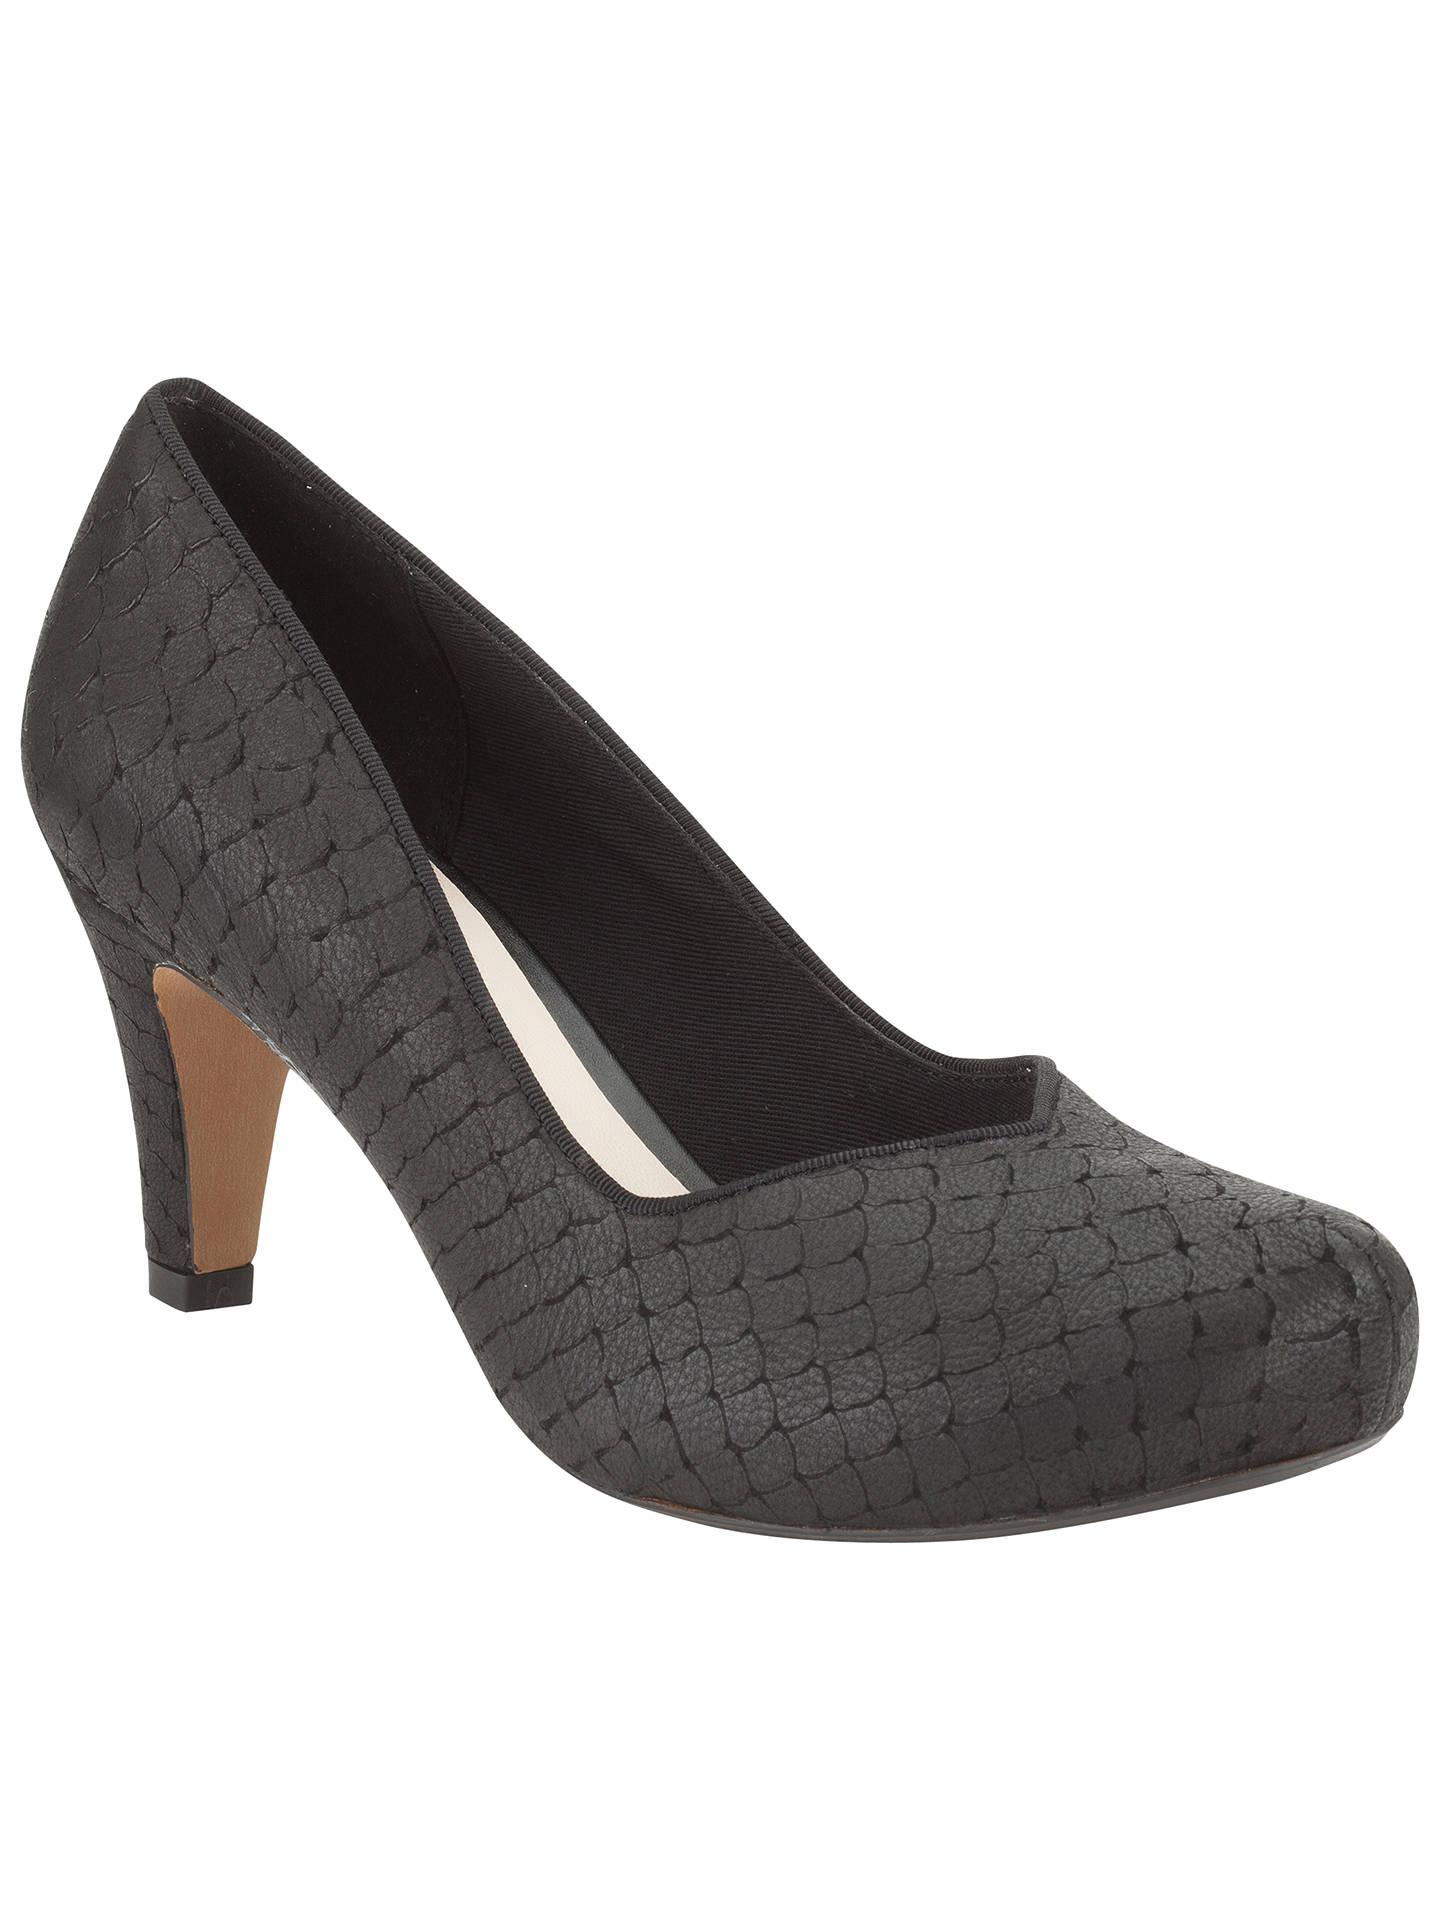 Clarks Chorus Voice Leather Court Shoes, Black Interest at